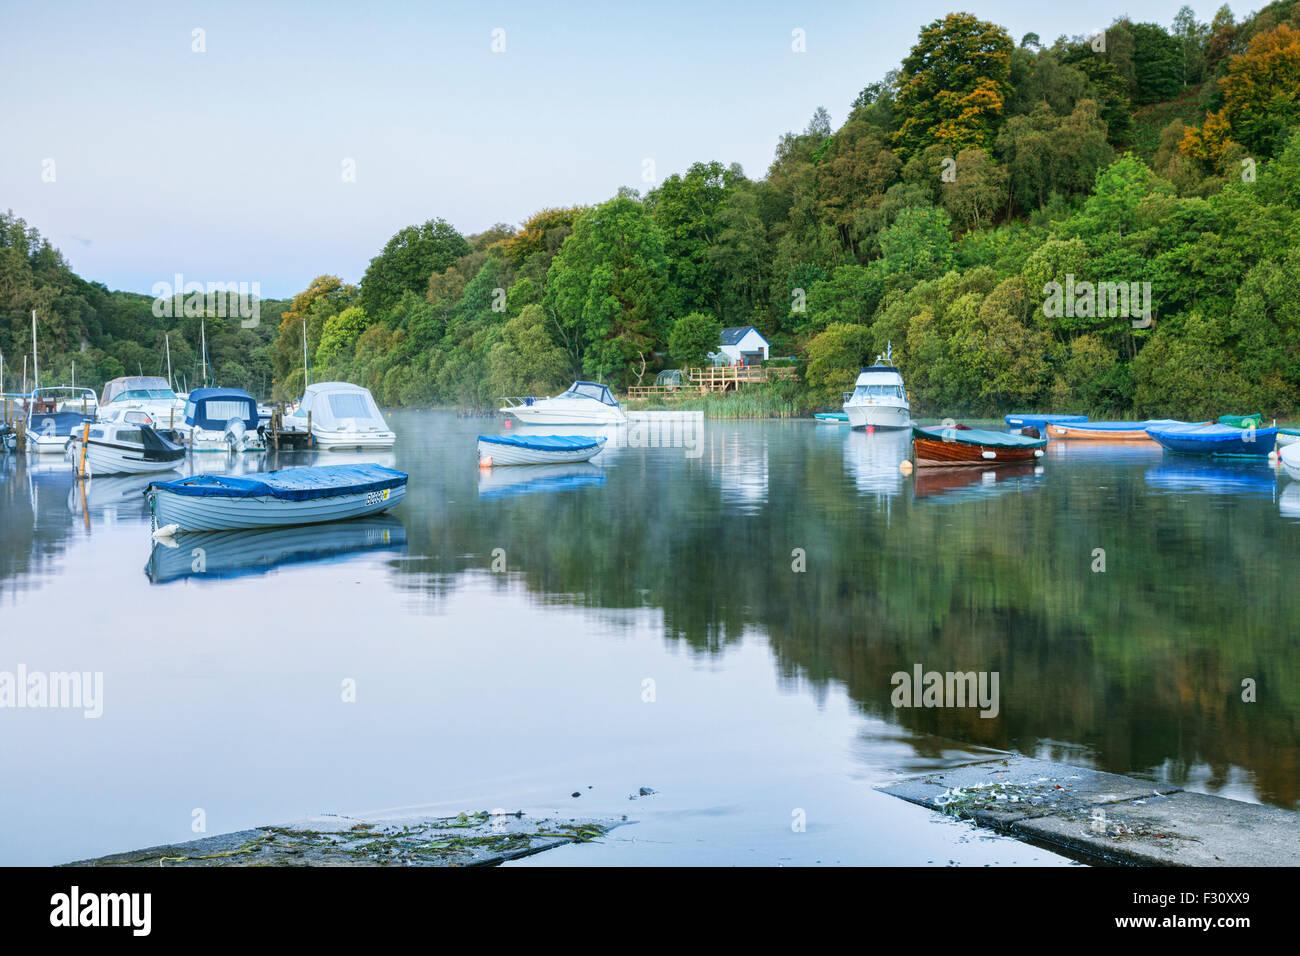 Harbour at Balmaha, Loch Lomond, Stirlingshire, Scotland, UK. - Stock Image